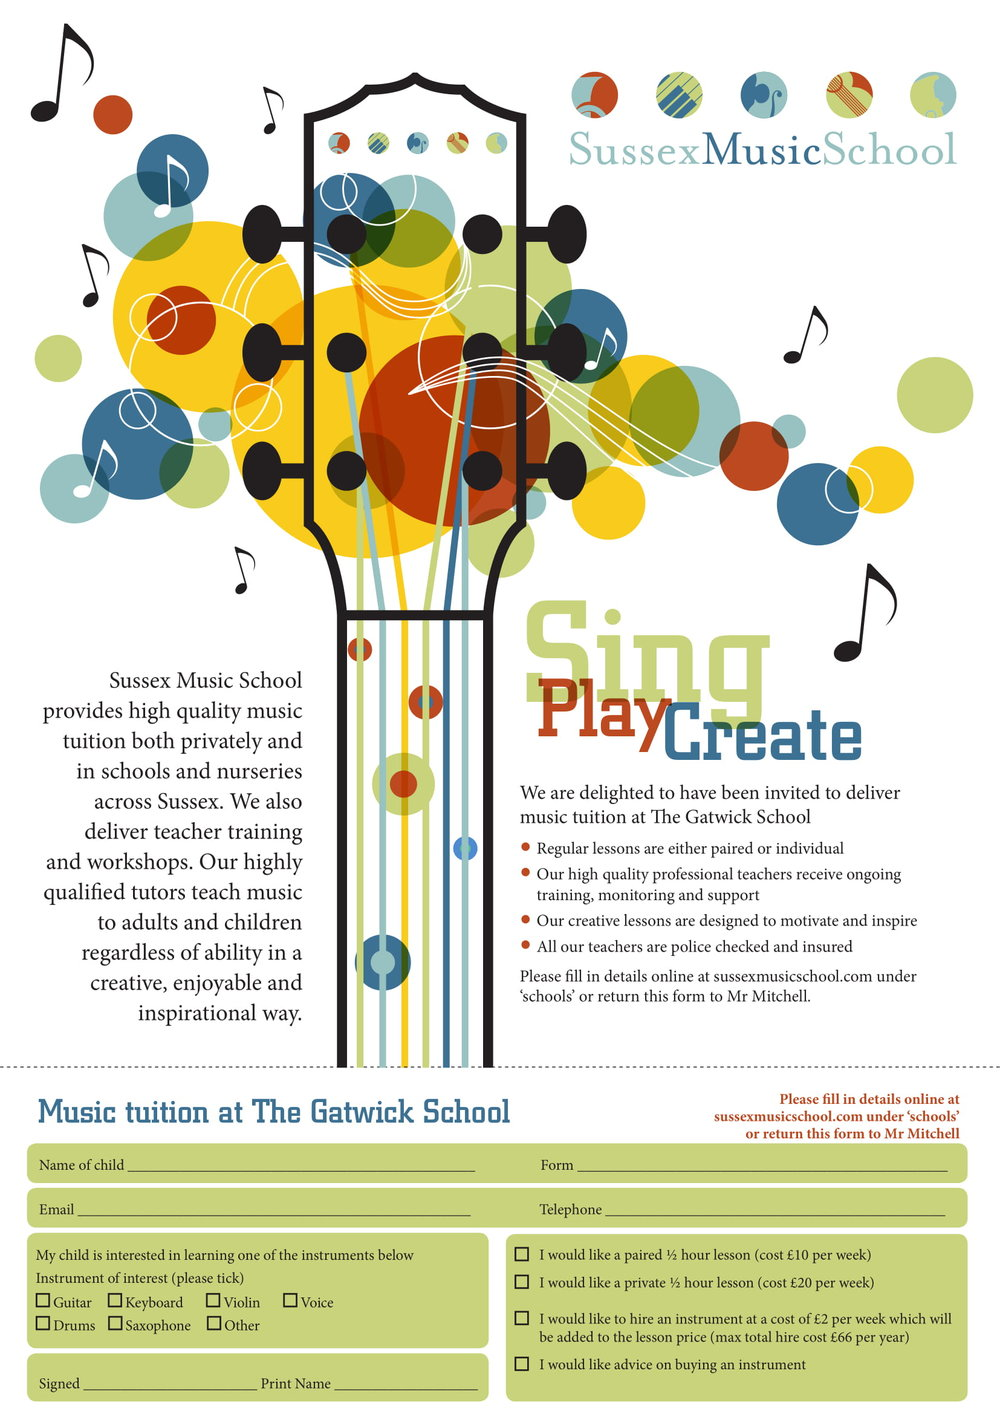 Sussex Music School_Gatwick School-1.jpg